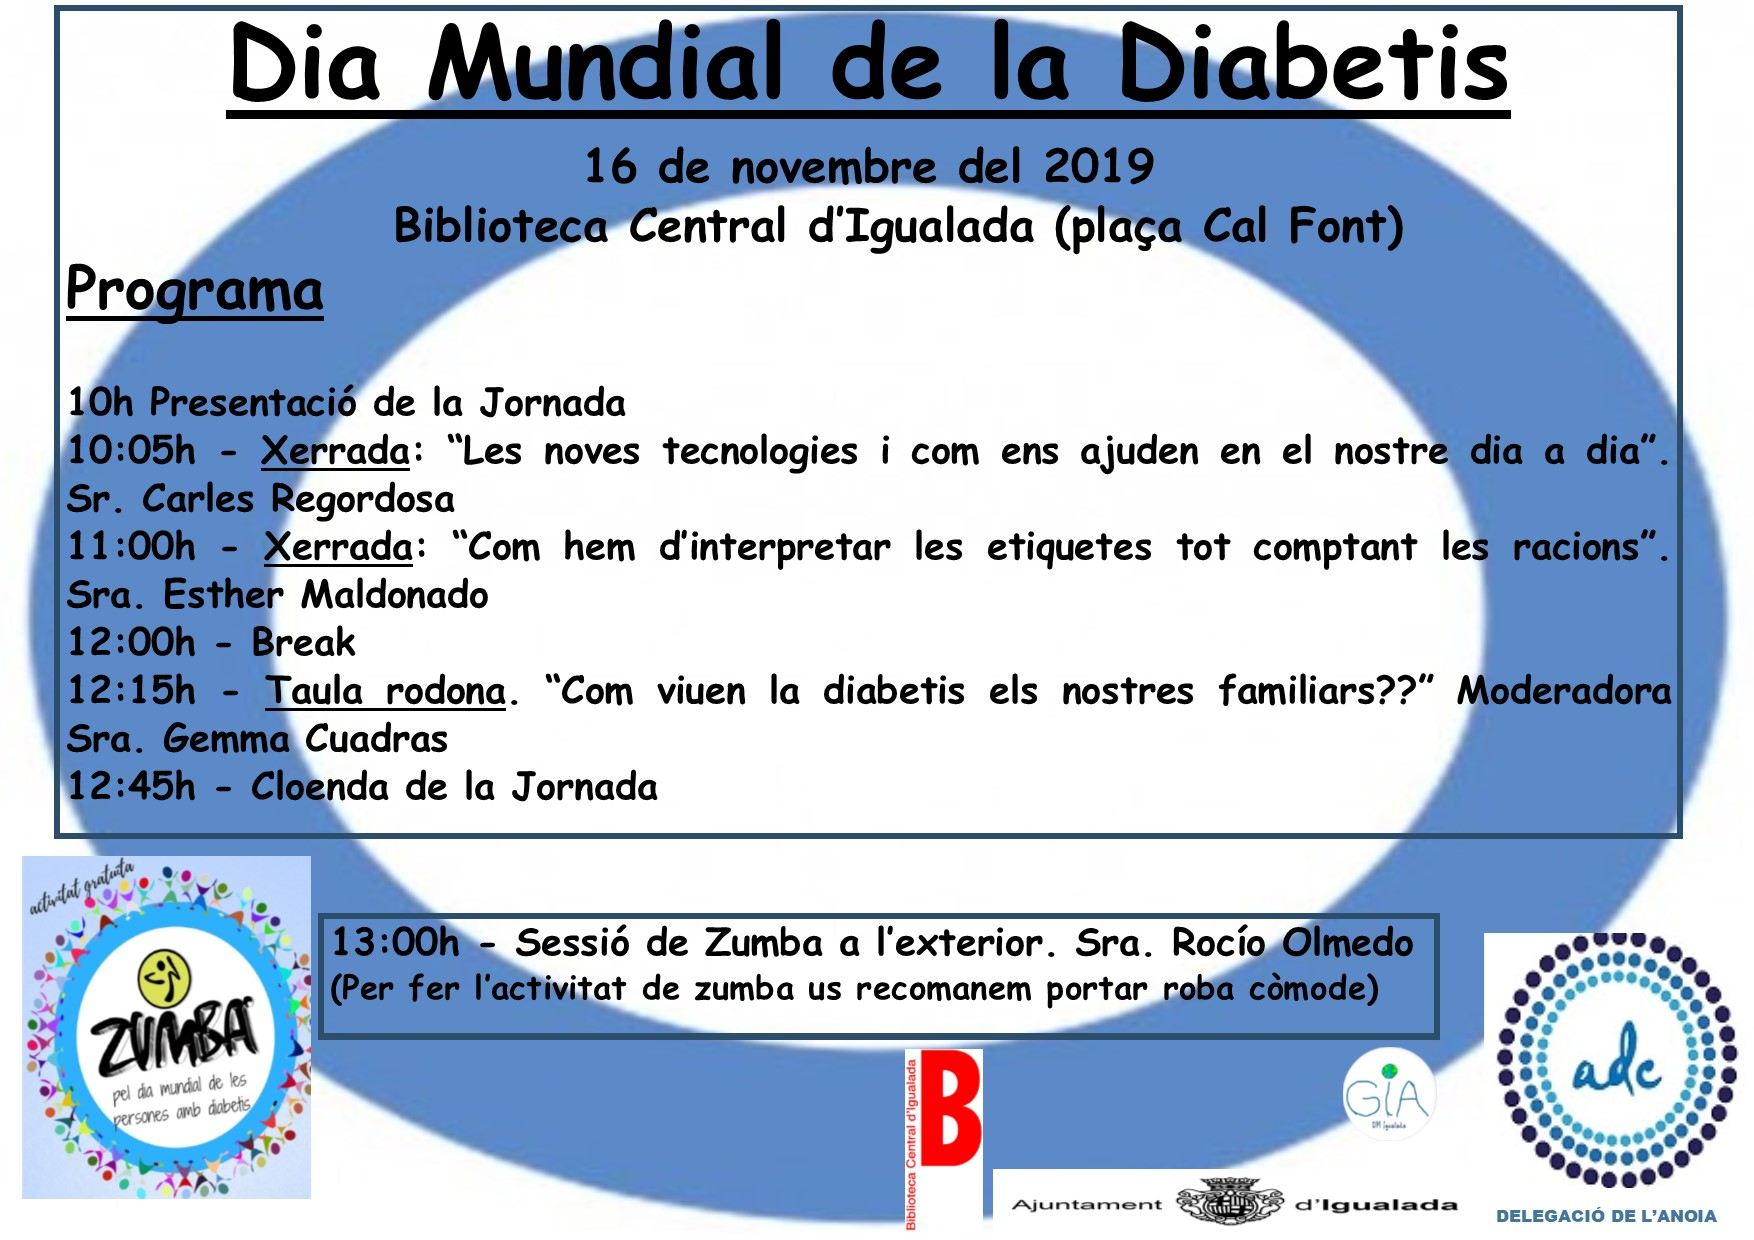 DM diabetis 2019